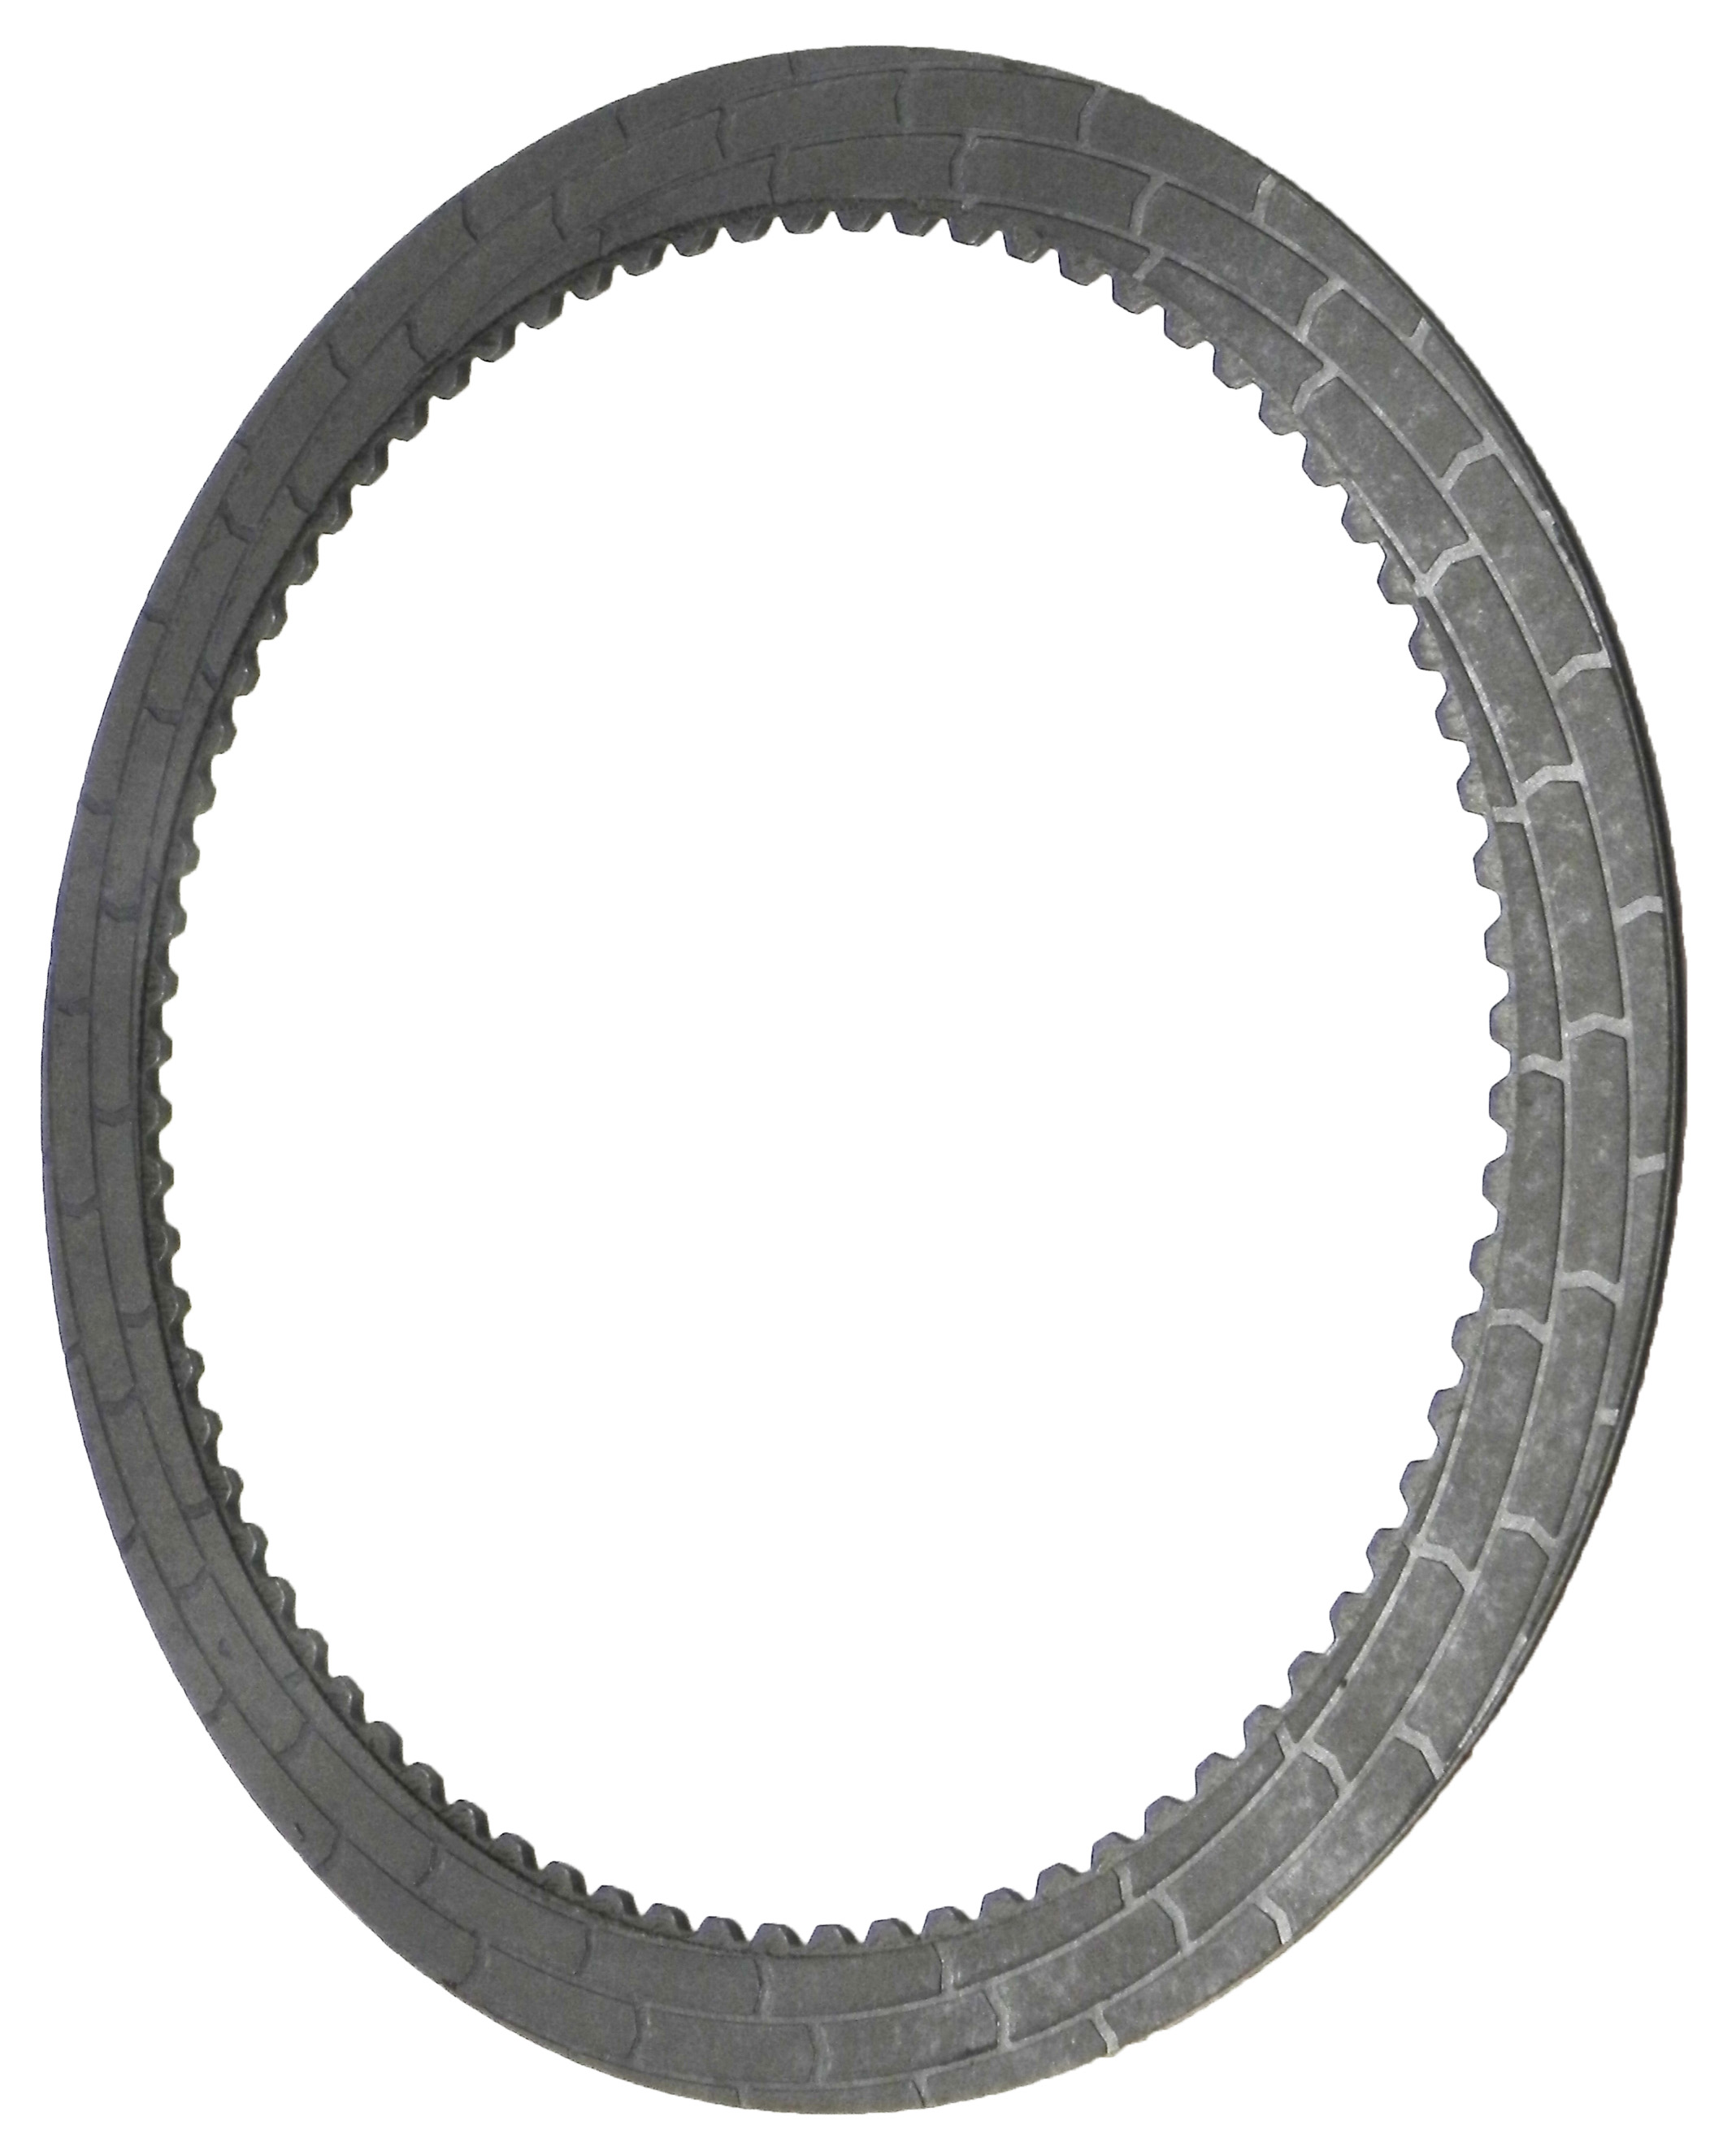 RH575152 | 2005-ON Friction Clutch Plate (HT) Hybrid Technology Forward Clutch Proprietary High Energy (HT)